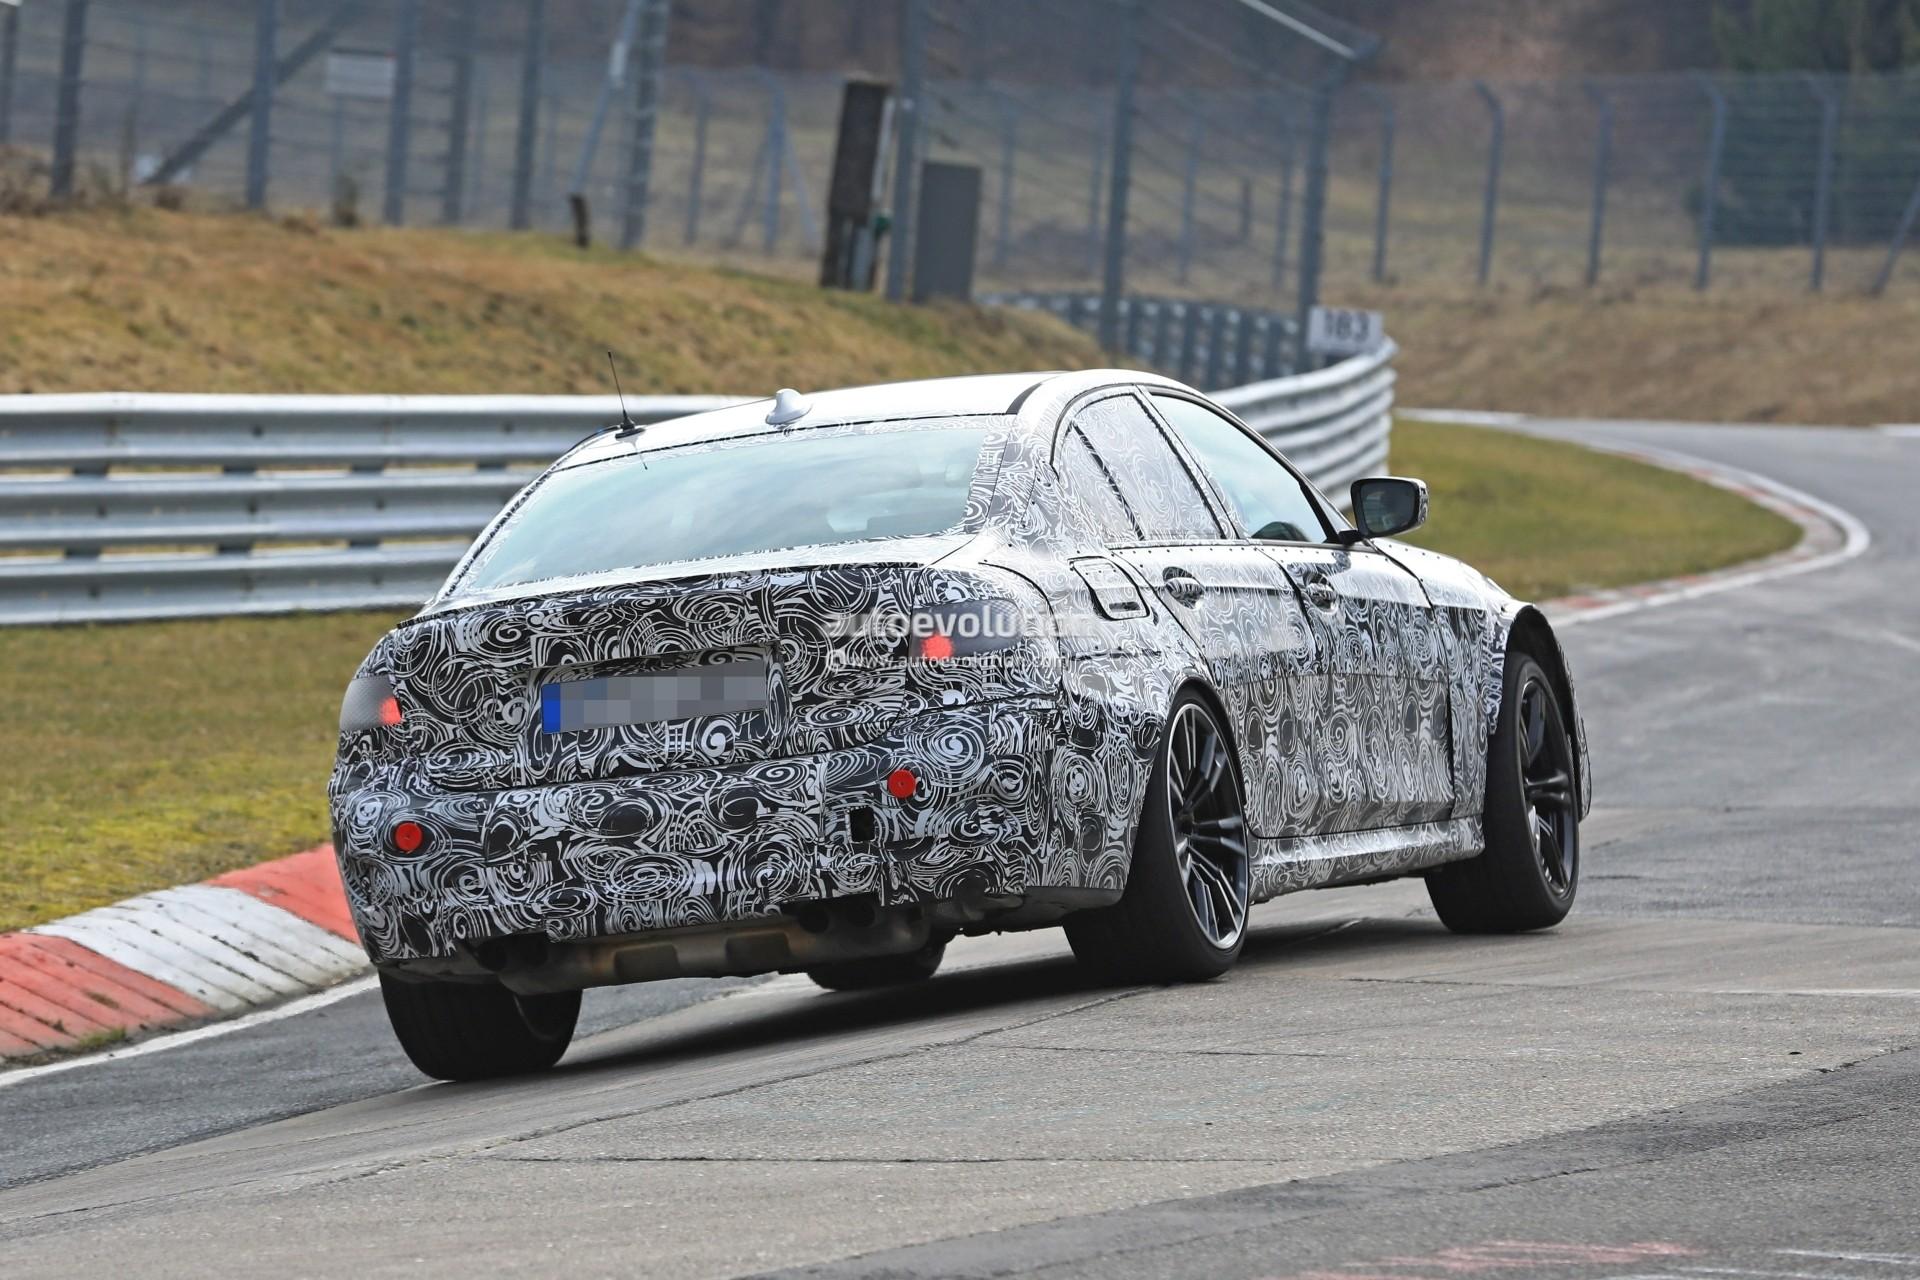 Spyshots: 2020 BMW M3 (G80) Uses Secret Three-Wheeler Mode ...